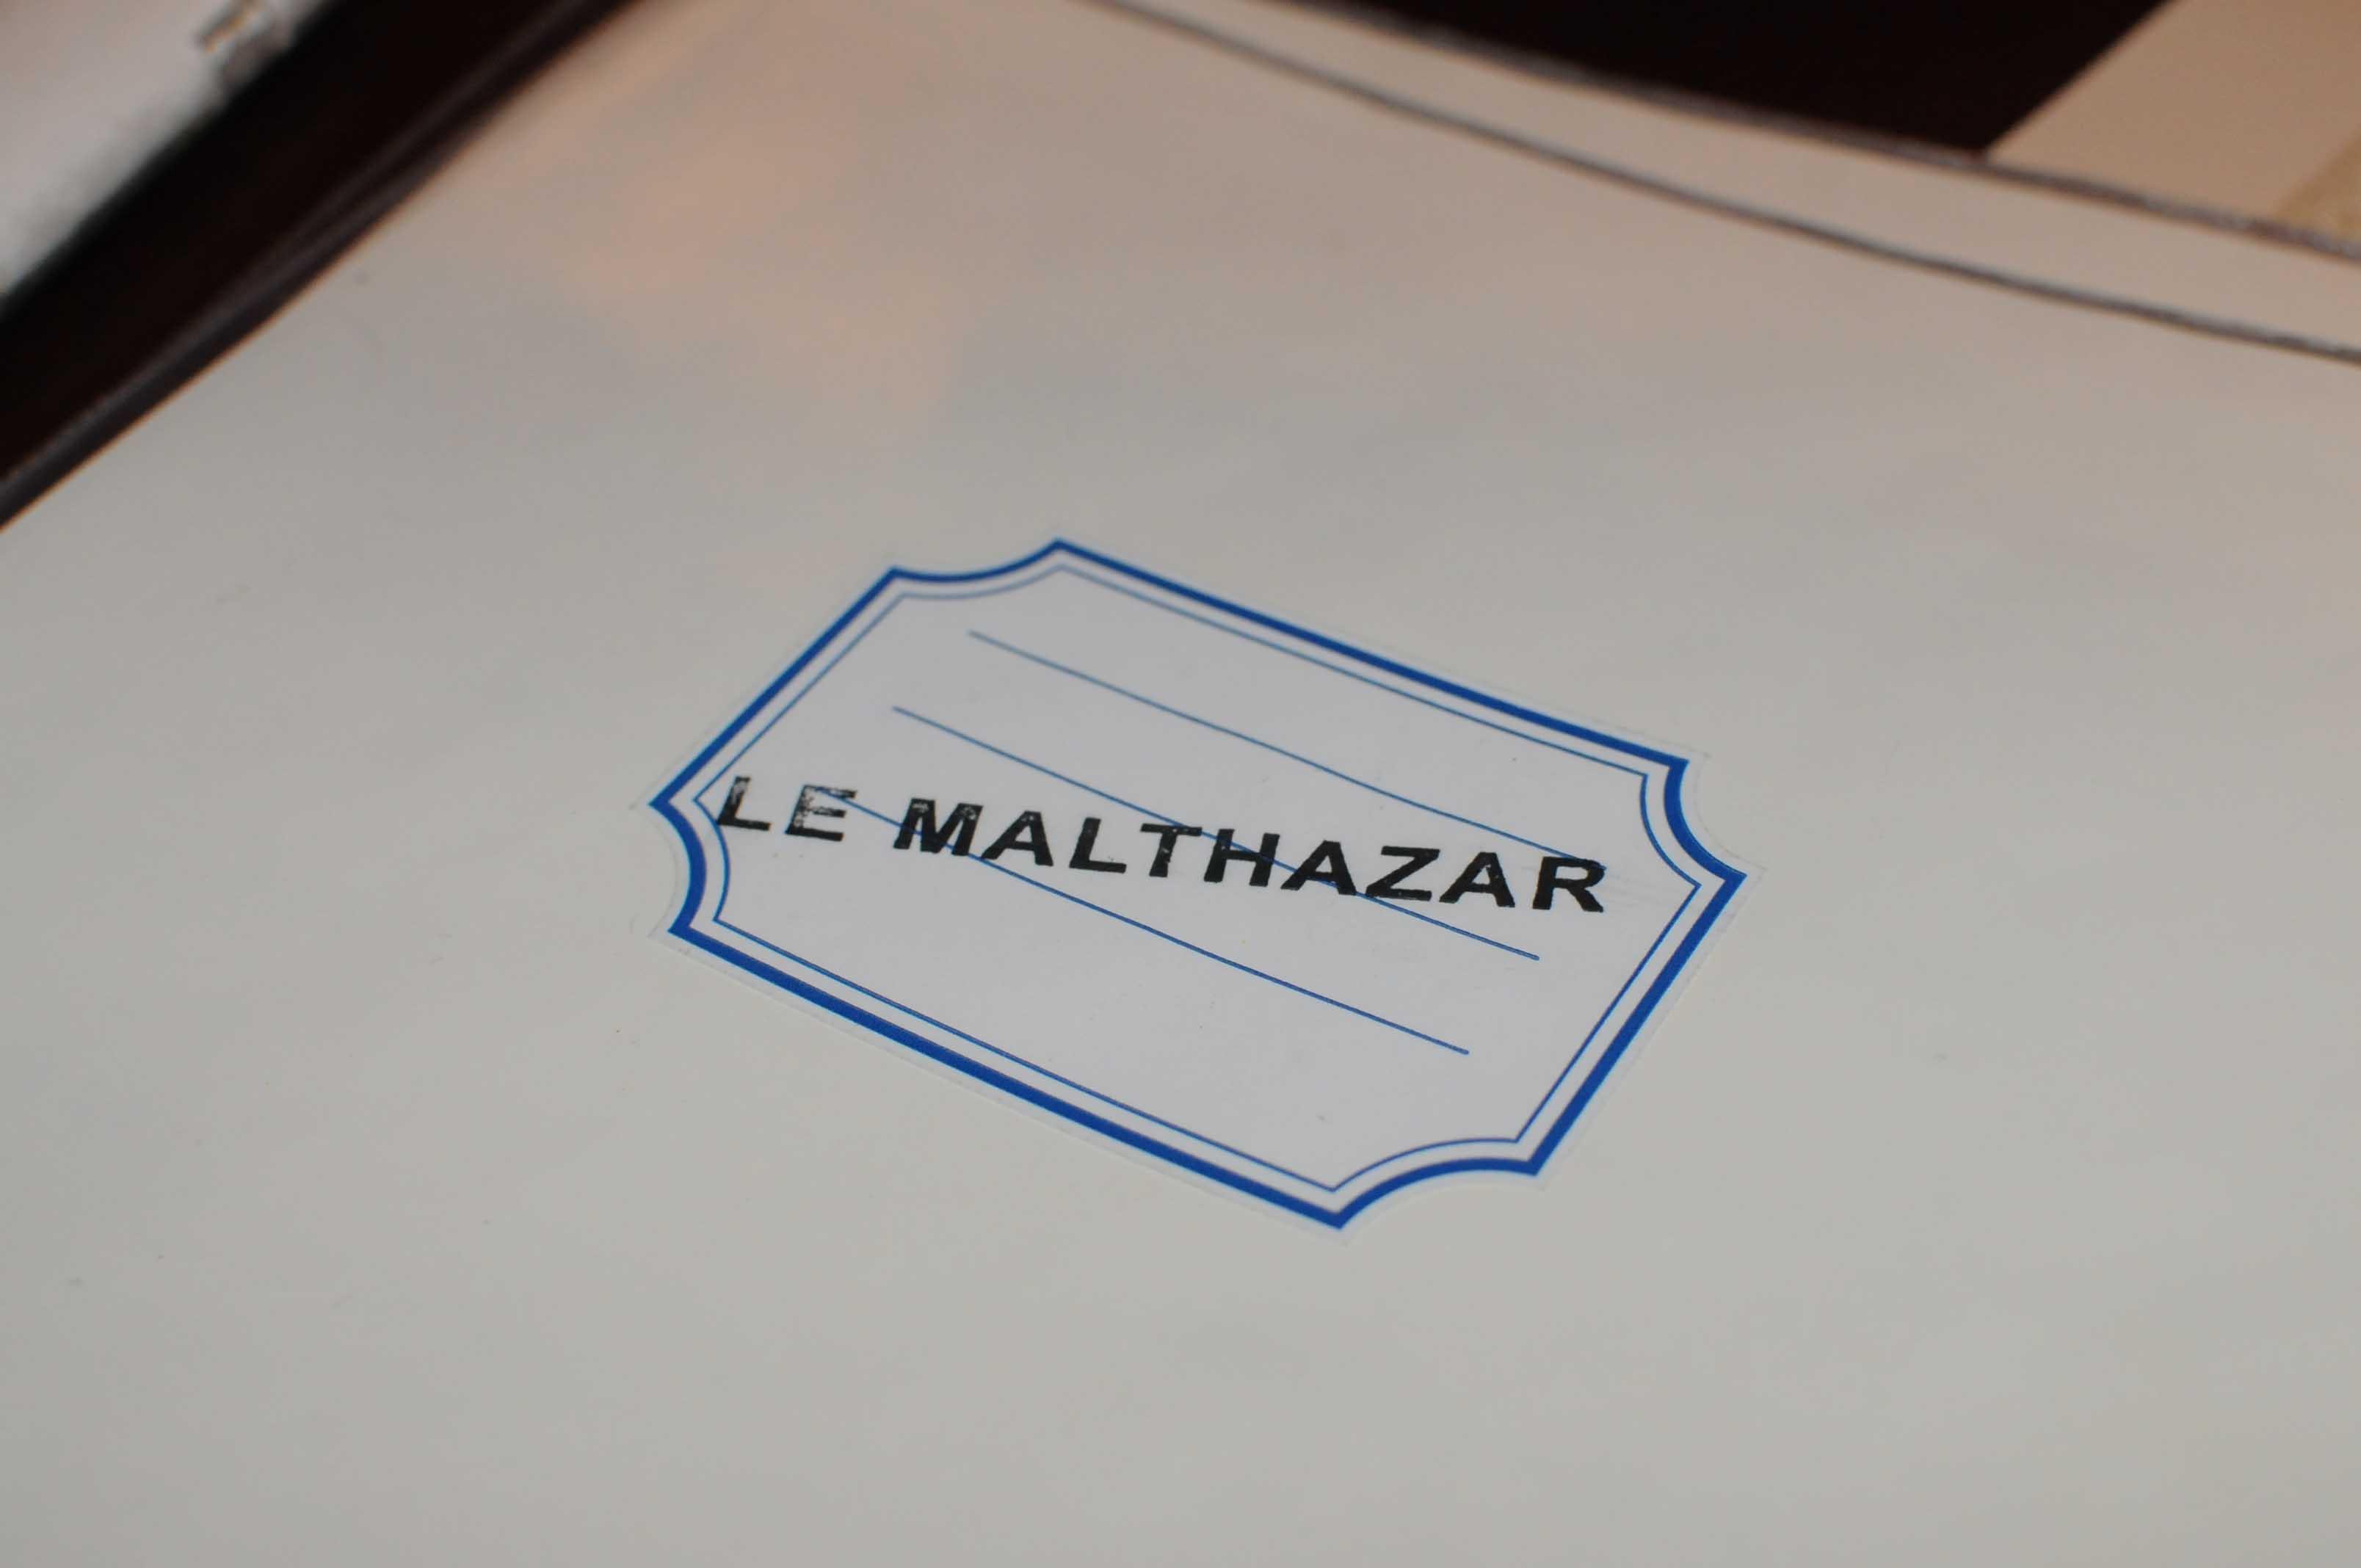 Dîner chez Michel Portos, au Malthazar à Marseille